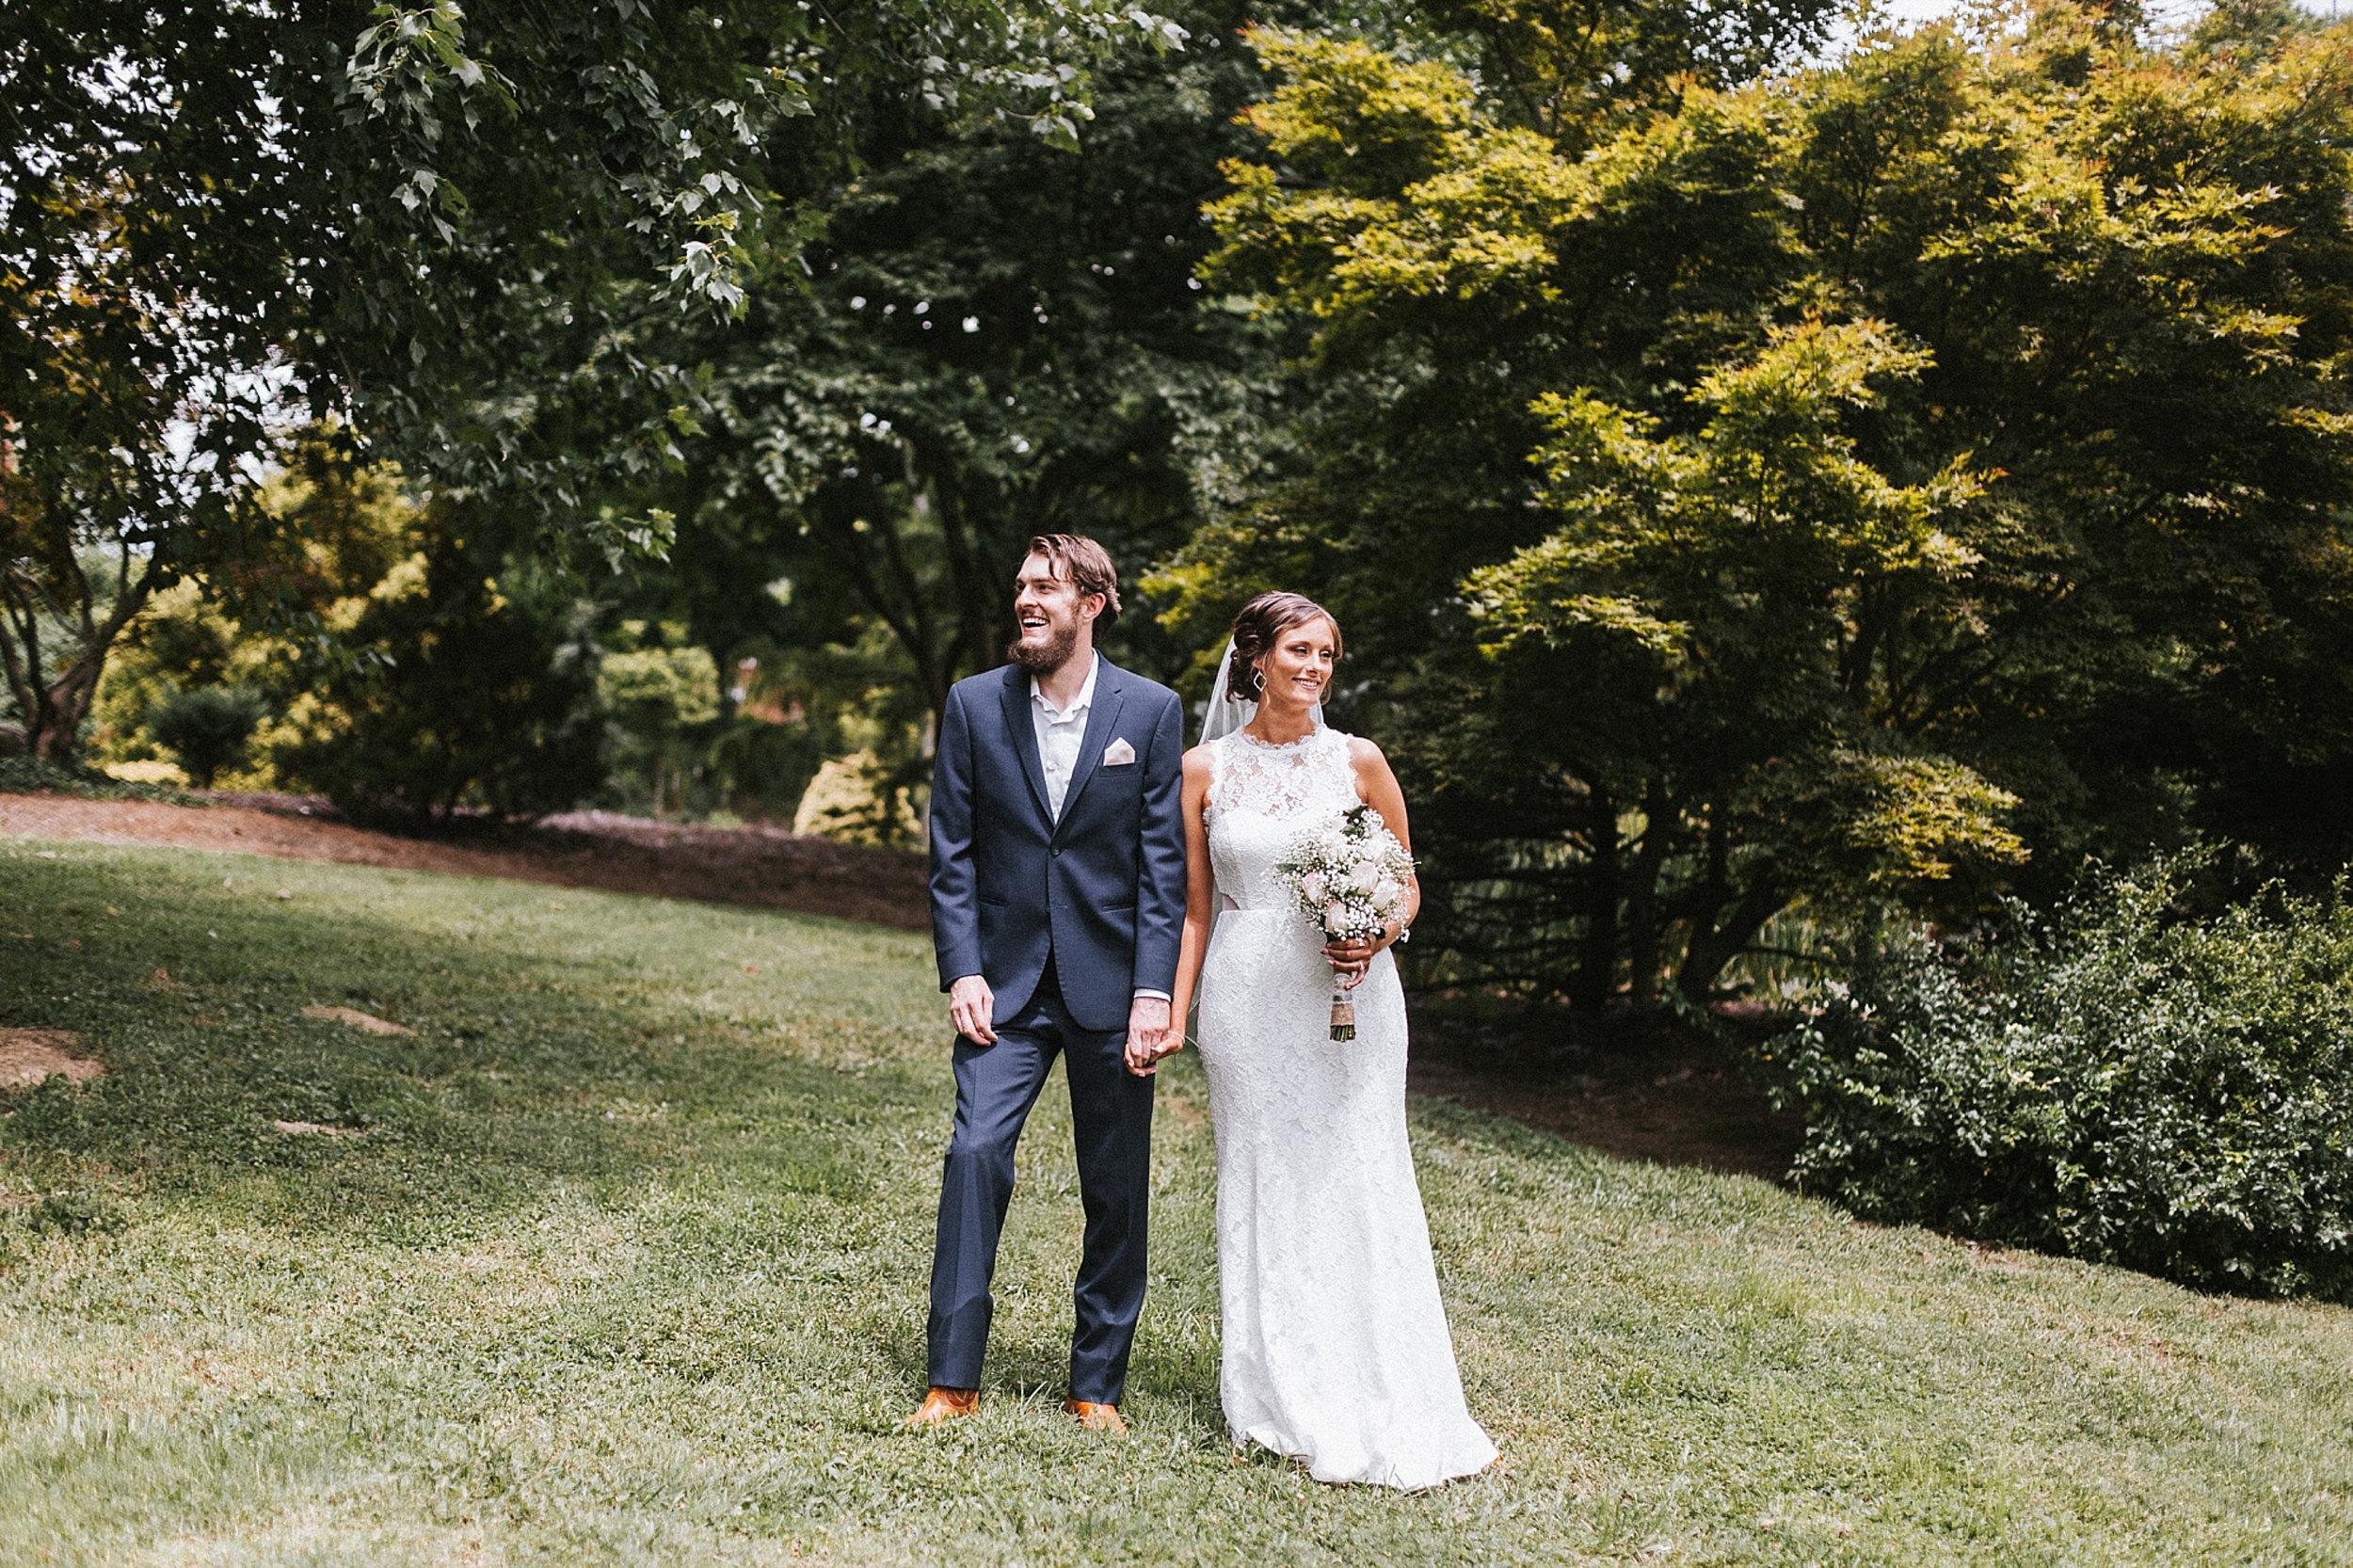 Brooke Townsend Photography - Ohio Wedding Photographer (20 of 78).jpg